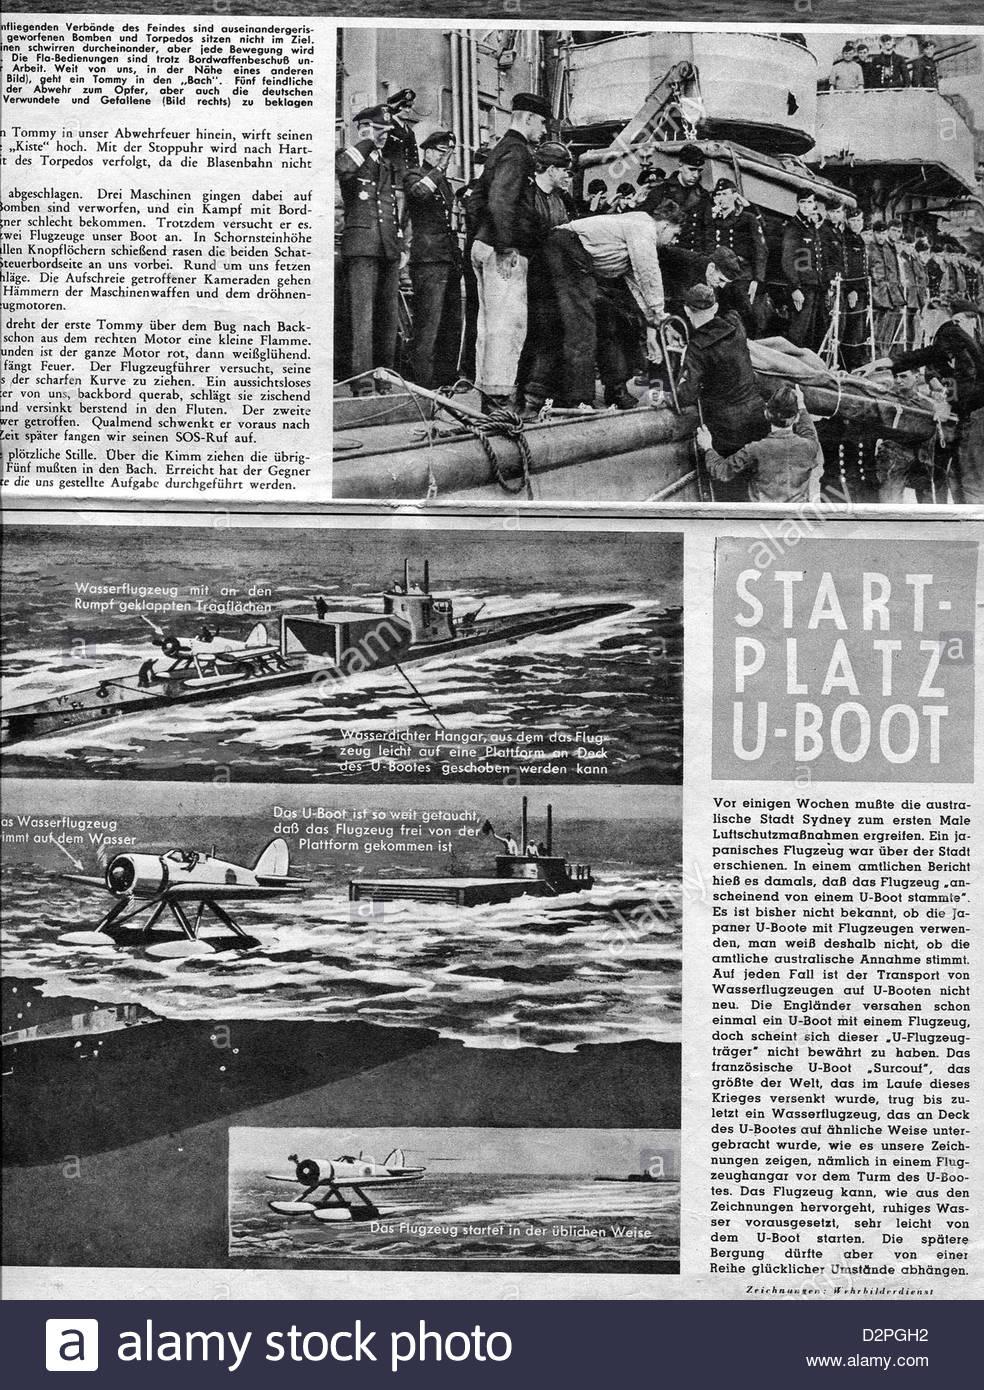 Page From Nazi German Propaganda Newspaper Showing U boats In Page From Nazi German Propaganda Newspaper Showing U Boats In Warfare DPGH Stock Photo Page From Nazi German Propaganda Newspaper Showing U Boats In Warfare